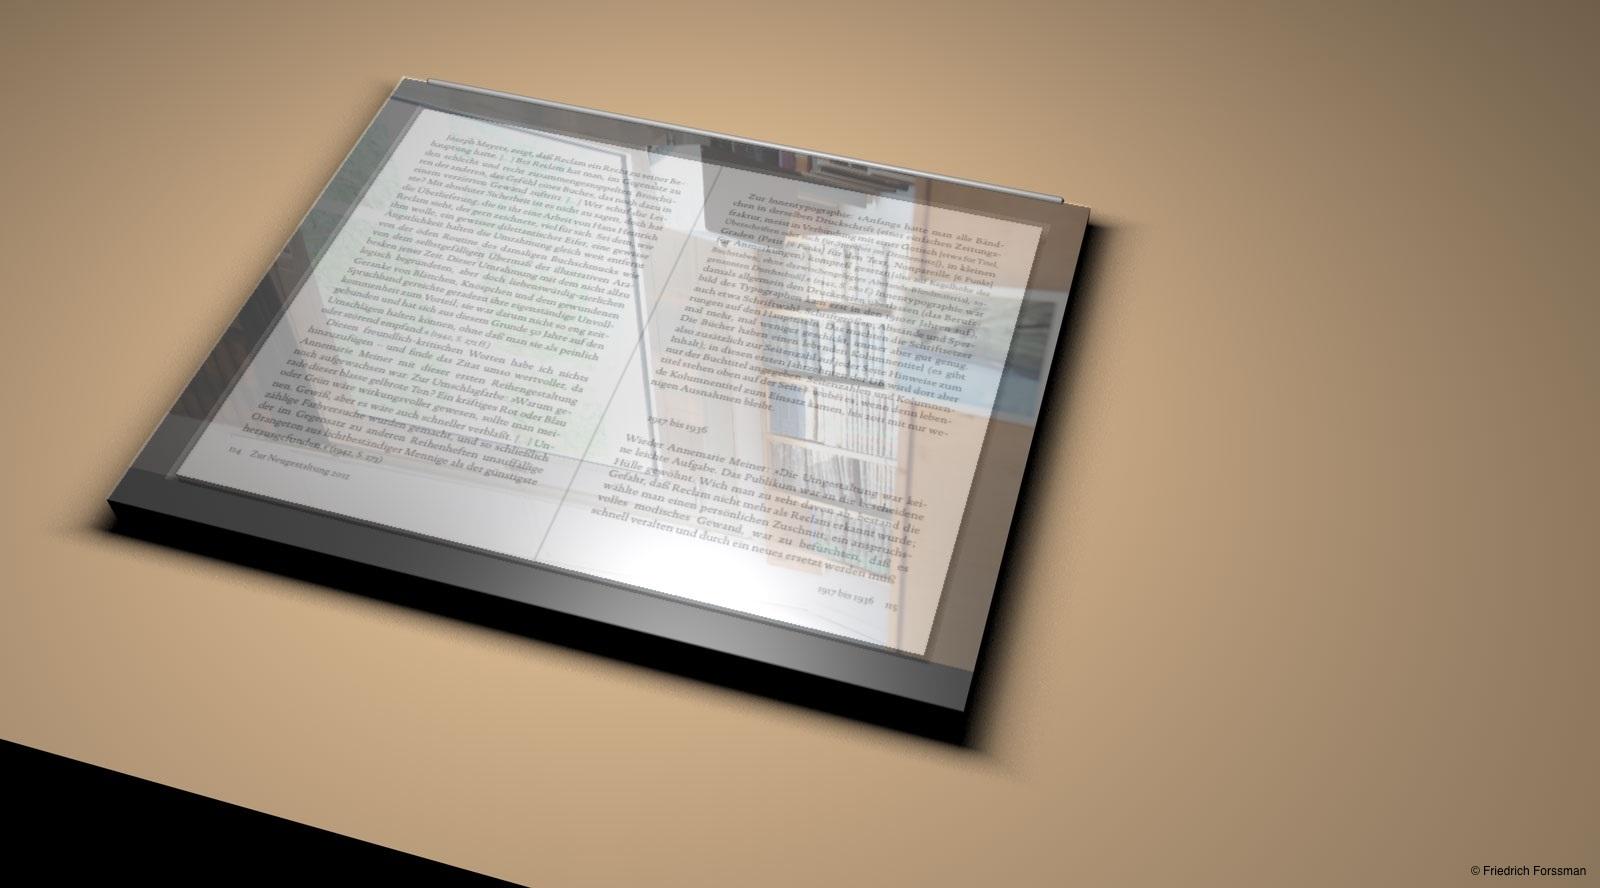 Auch an liebgewonnene Features ist gedacht: Die spiegelnde Oberfläche, an der Fingerabdrücke extra gut haften ...